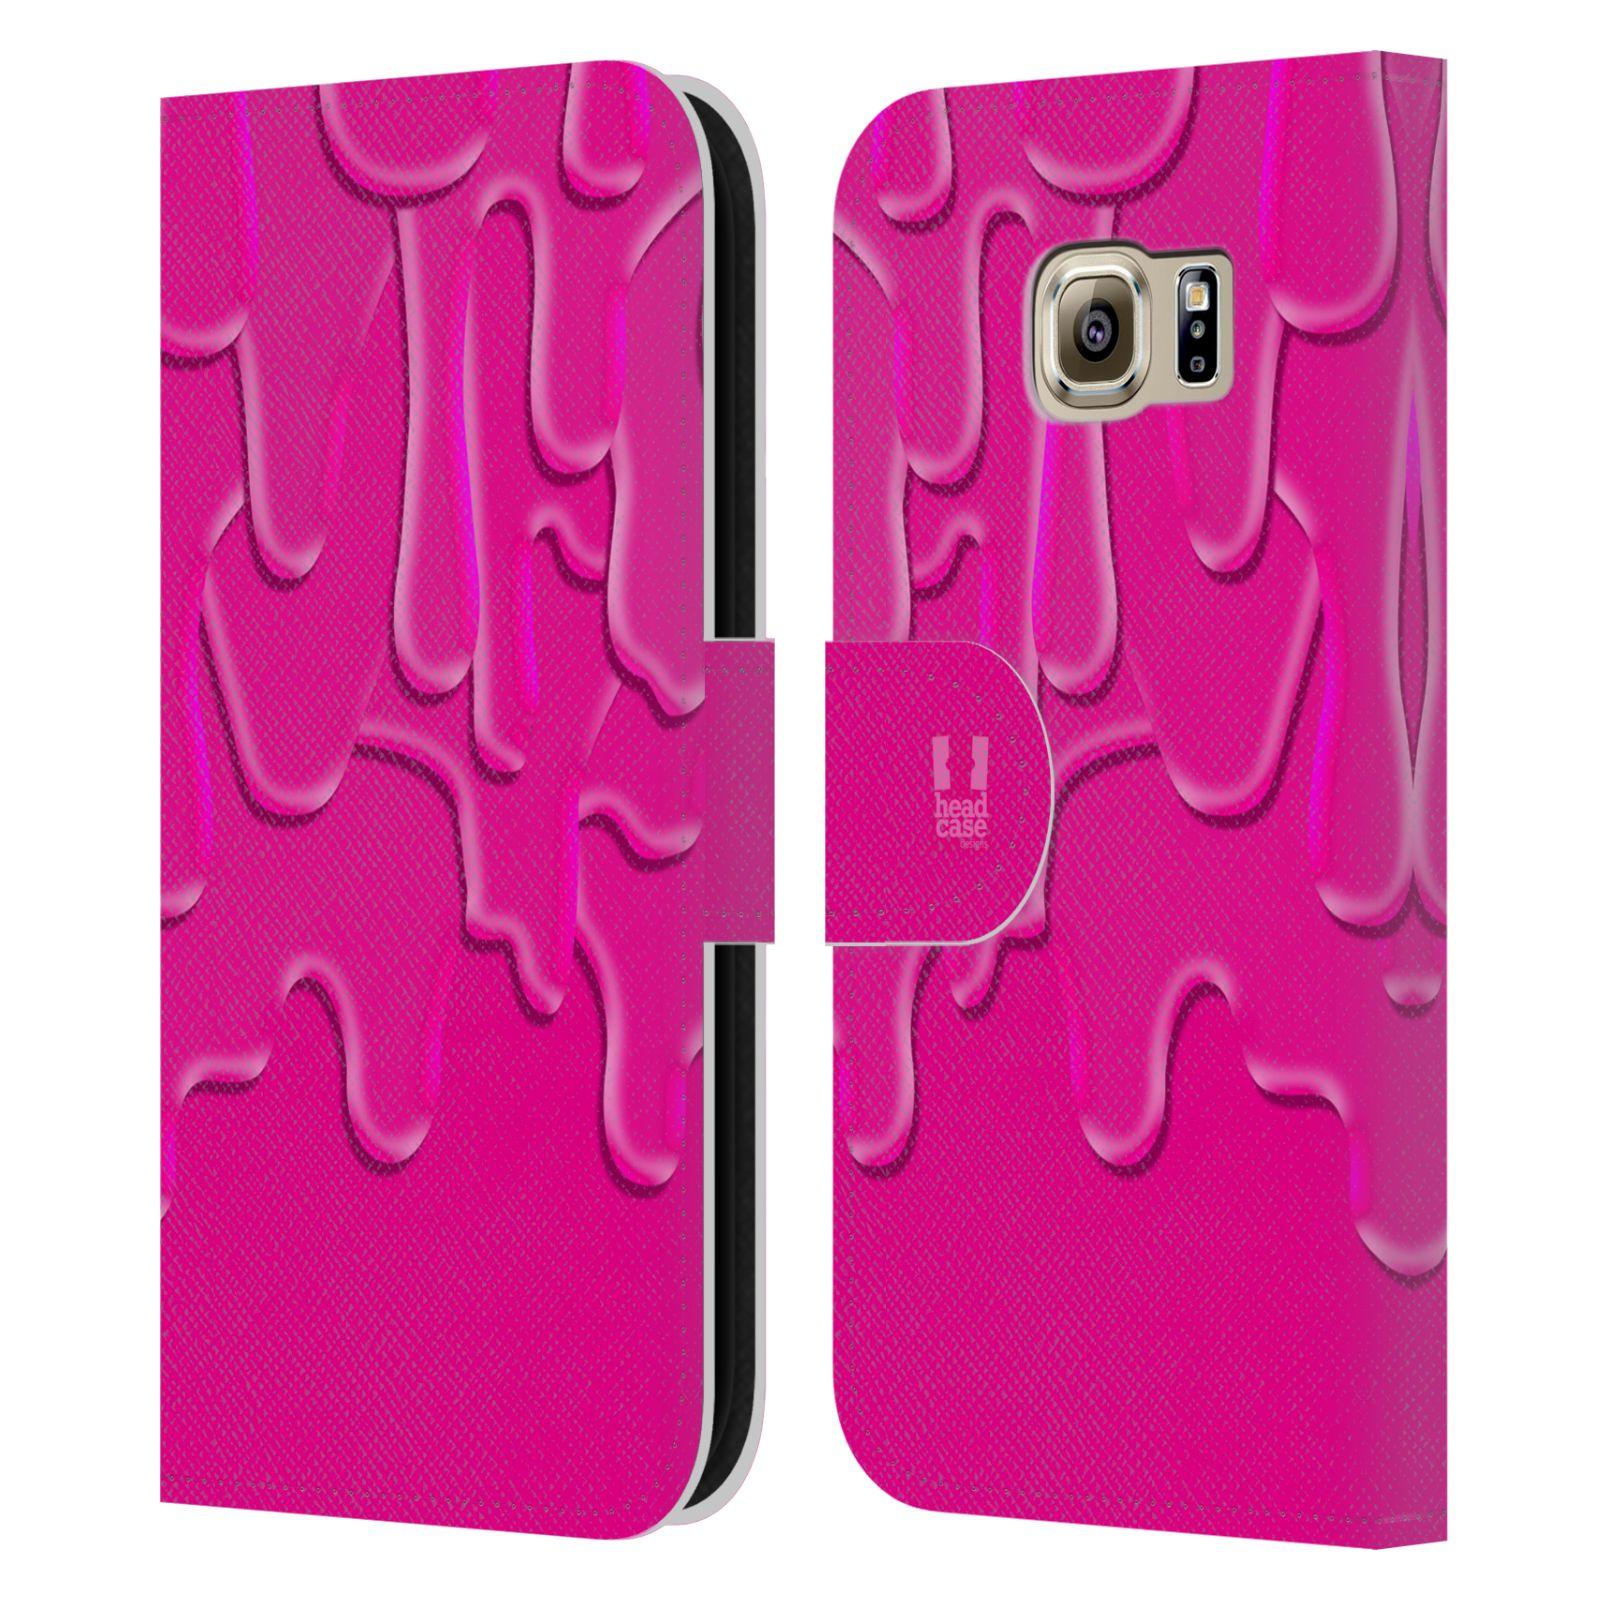 HEAD CASE Flipové pouzdro pro mobil Samsung Galaxy S6 (G9200) ZÁPLAVA BARVA růžová